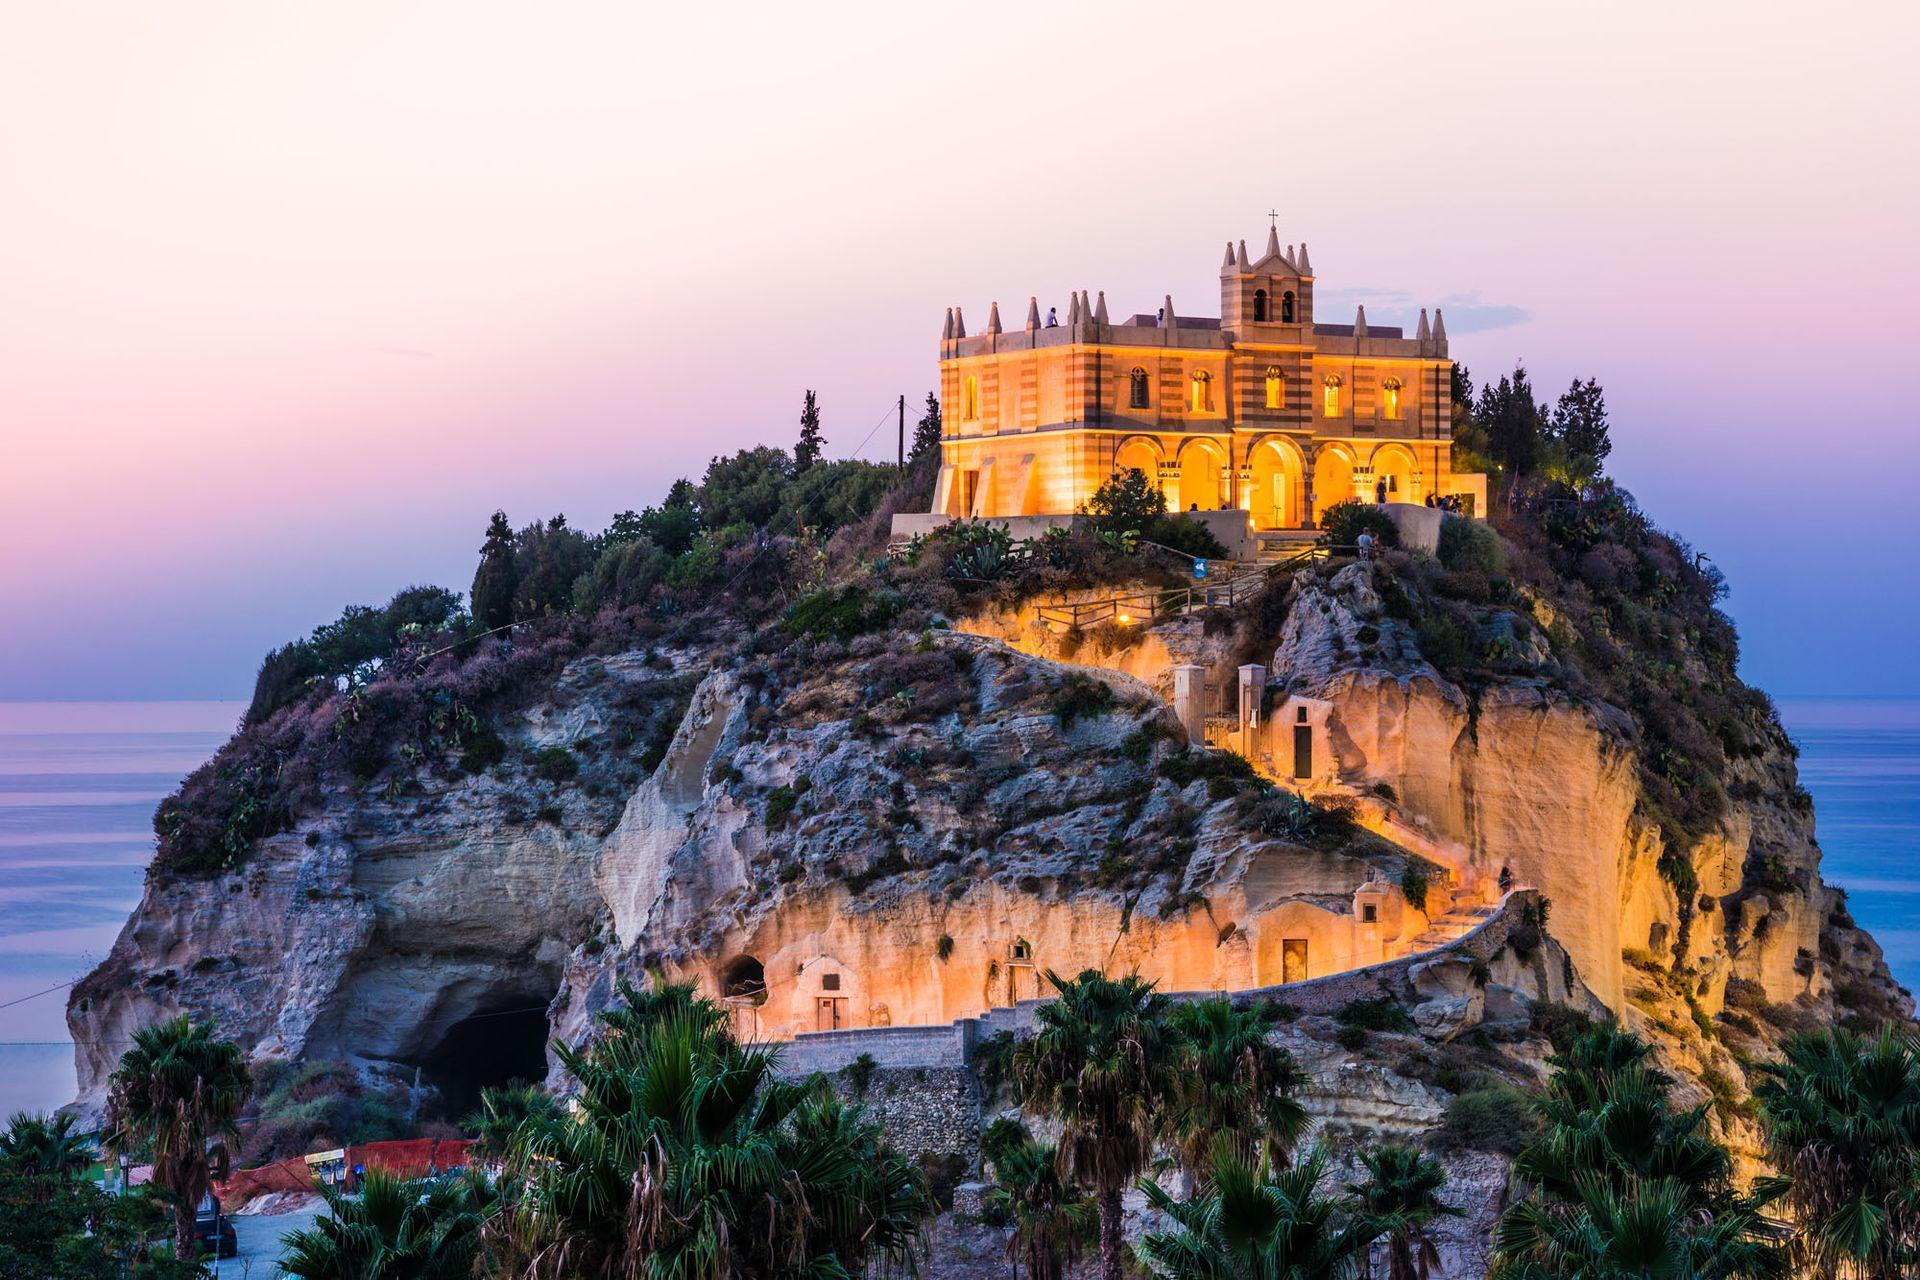 La iglesia Santa Maria del lIsola en Calabria